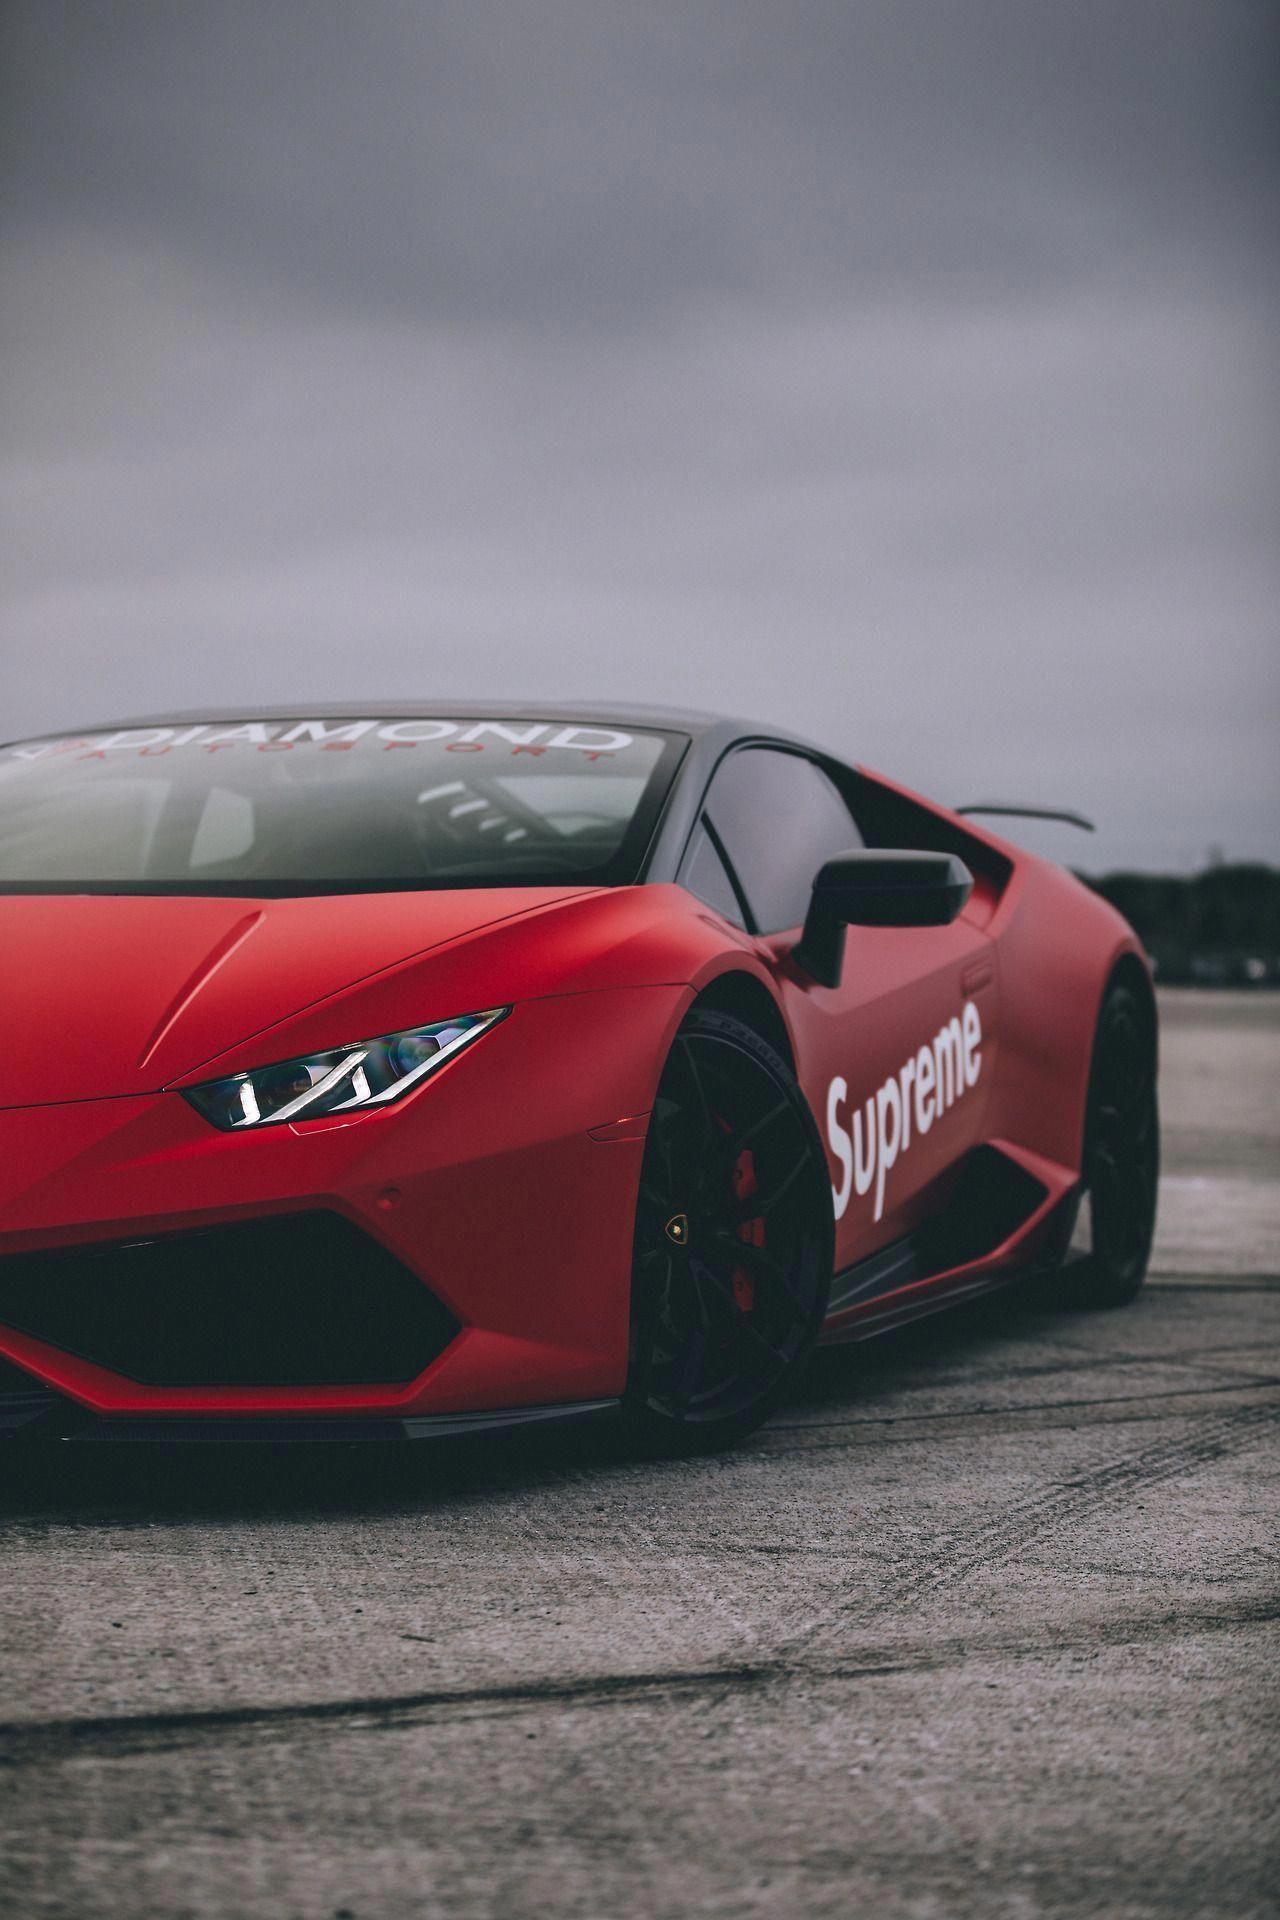 Best Sport Cars Affordable Small Luxury Cool Cars Lamborghini Aventador Lamborghiniaventadororang In 2020 Cool Sports Cars Super Luxury Cars Sports Car Wallpaper